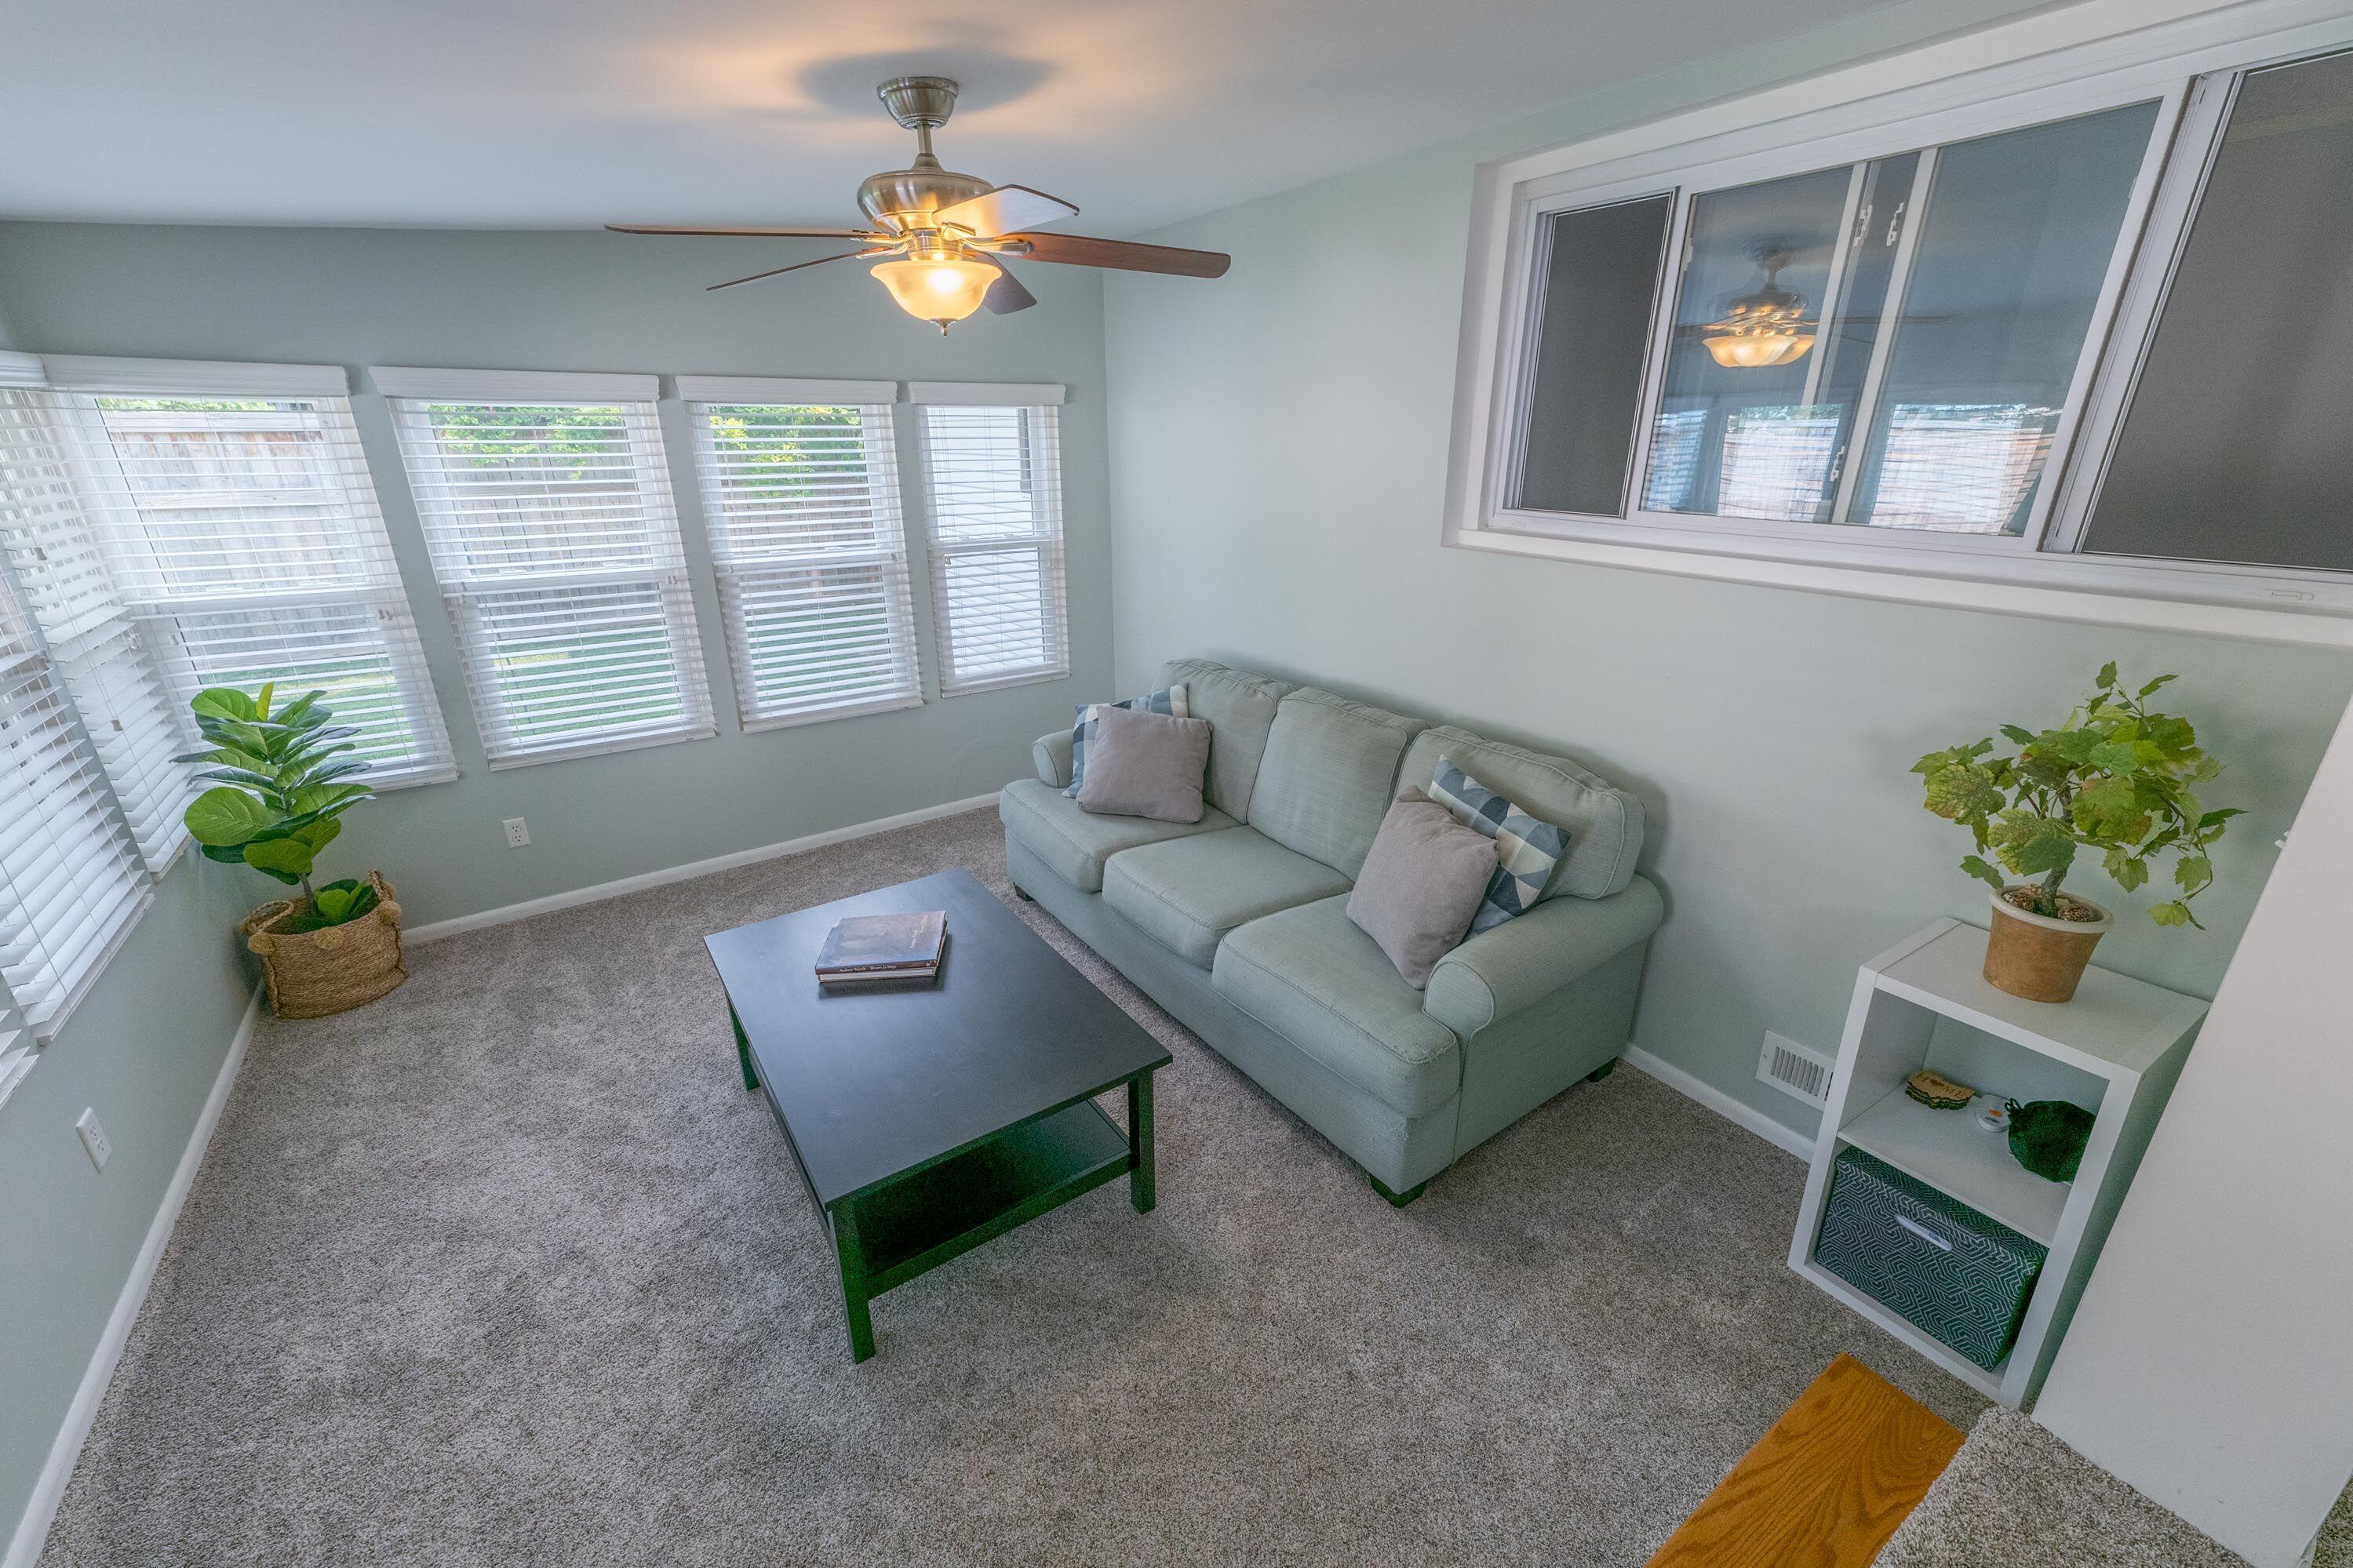 Sunroom with newer APCO windows